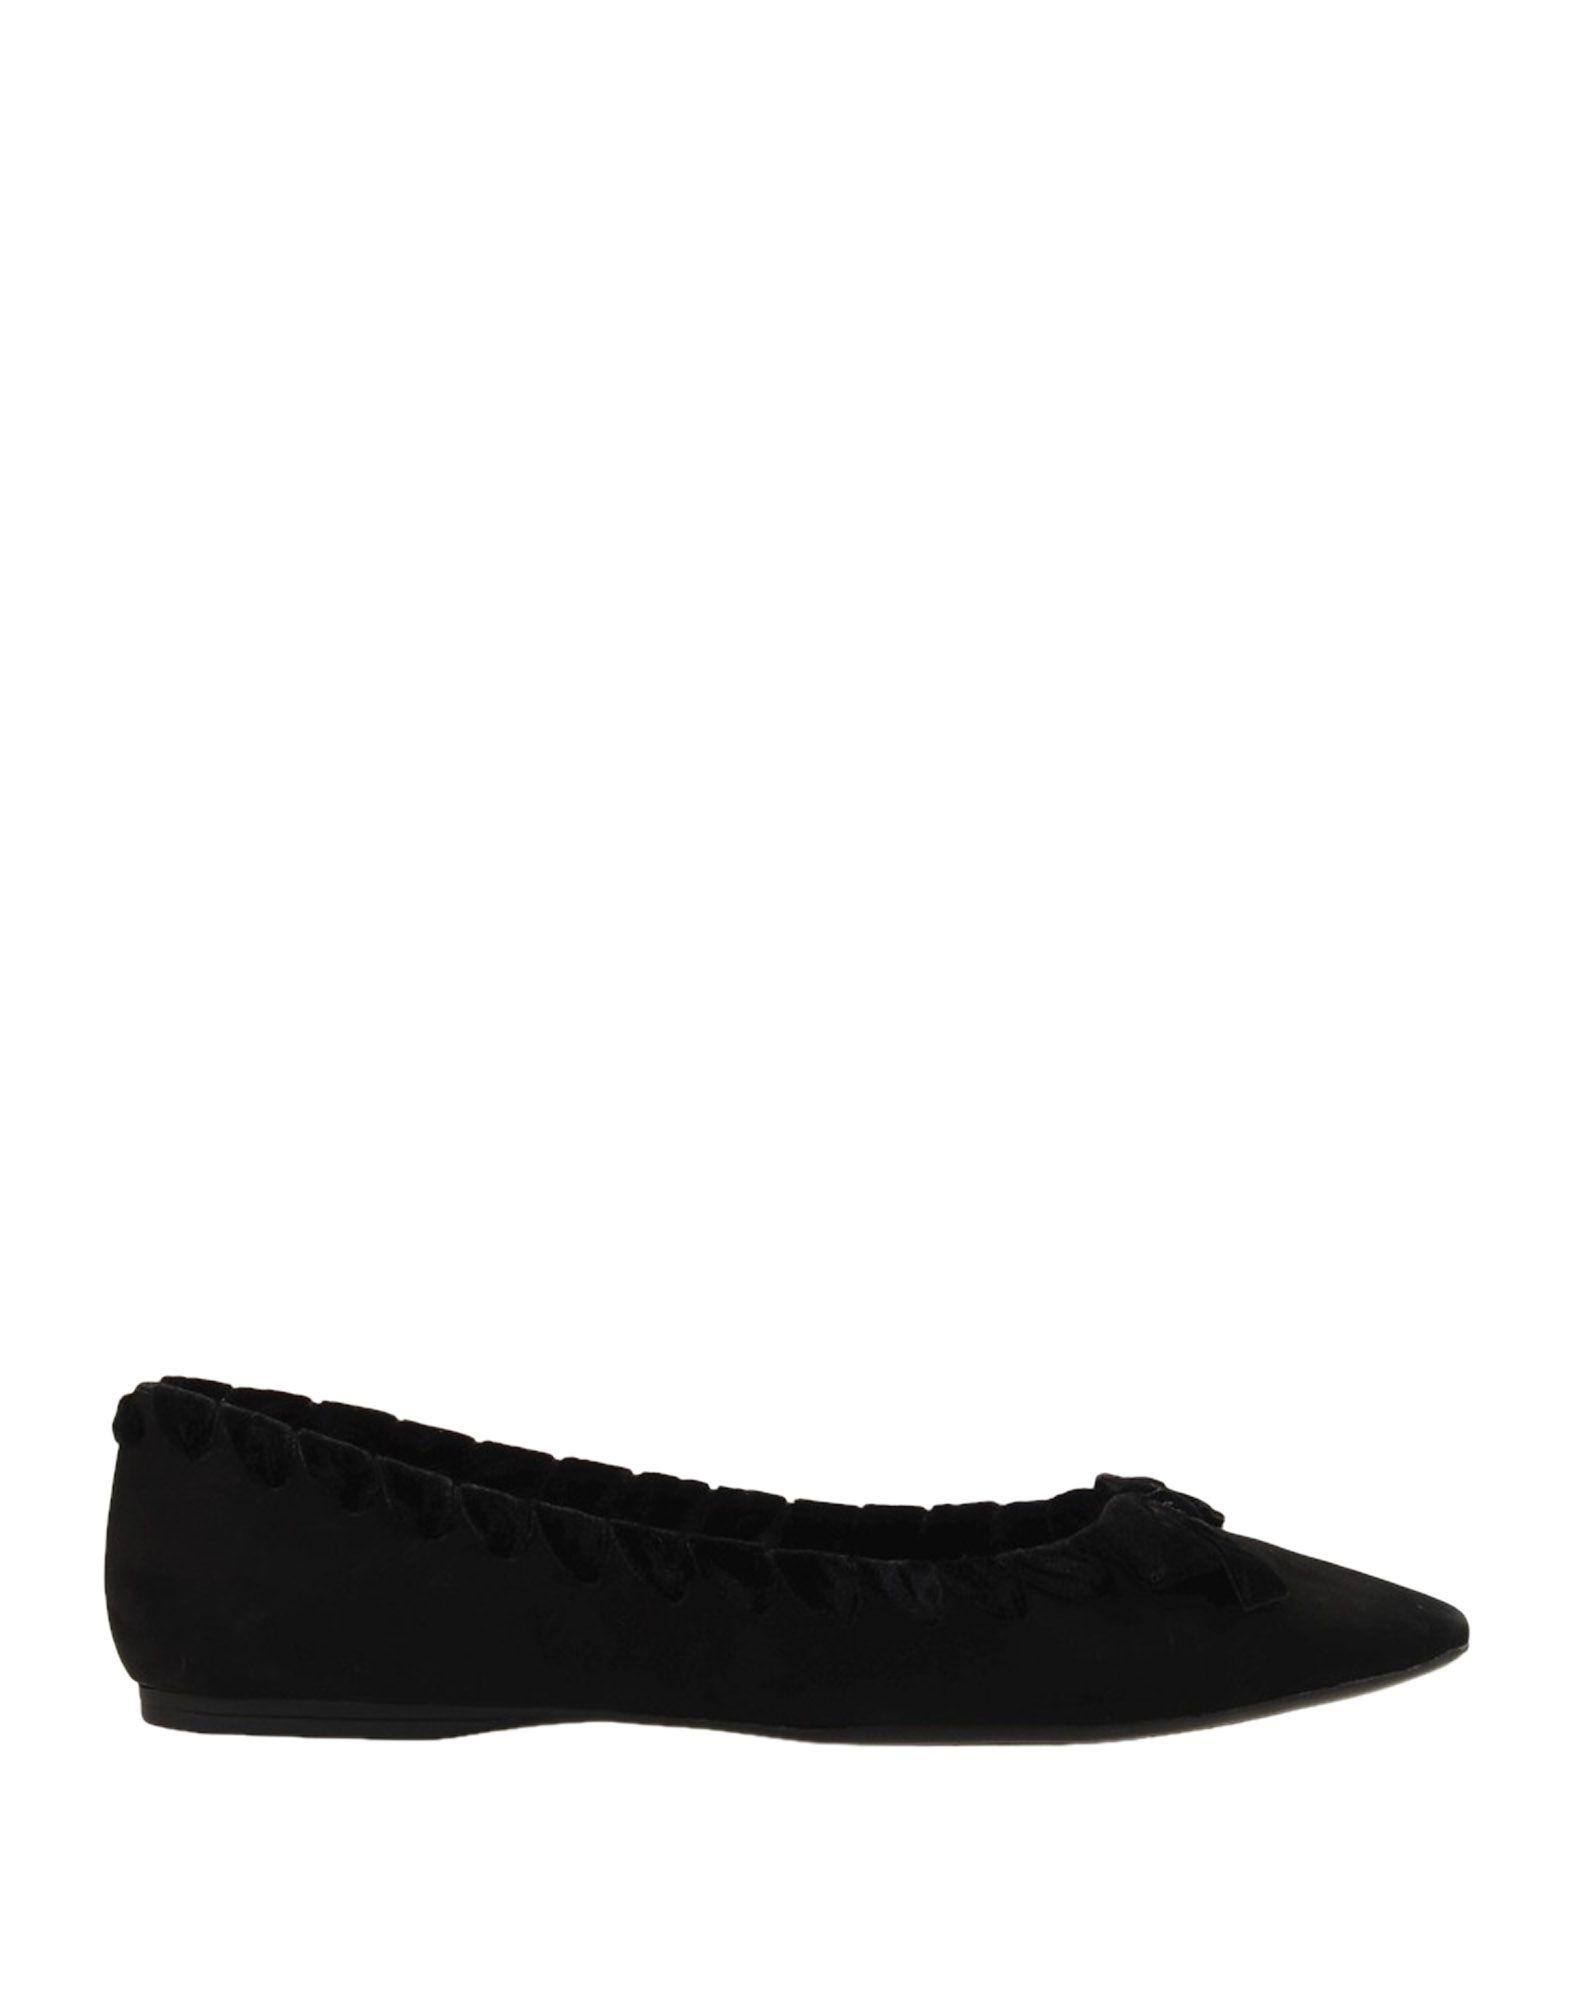 Arezzo Ballet Ballet Flats - Women Arezzo Ballet Ballet Flats online on  Australia - 11576651ON 7acff8